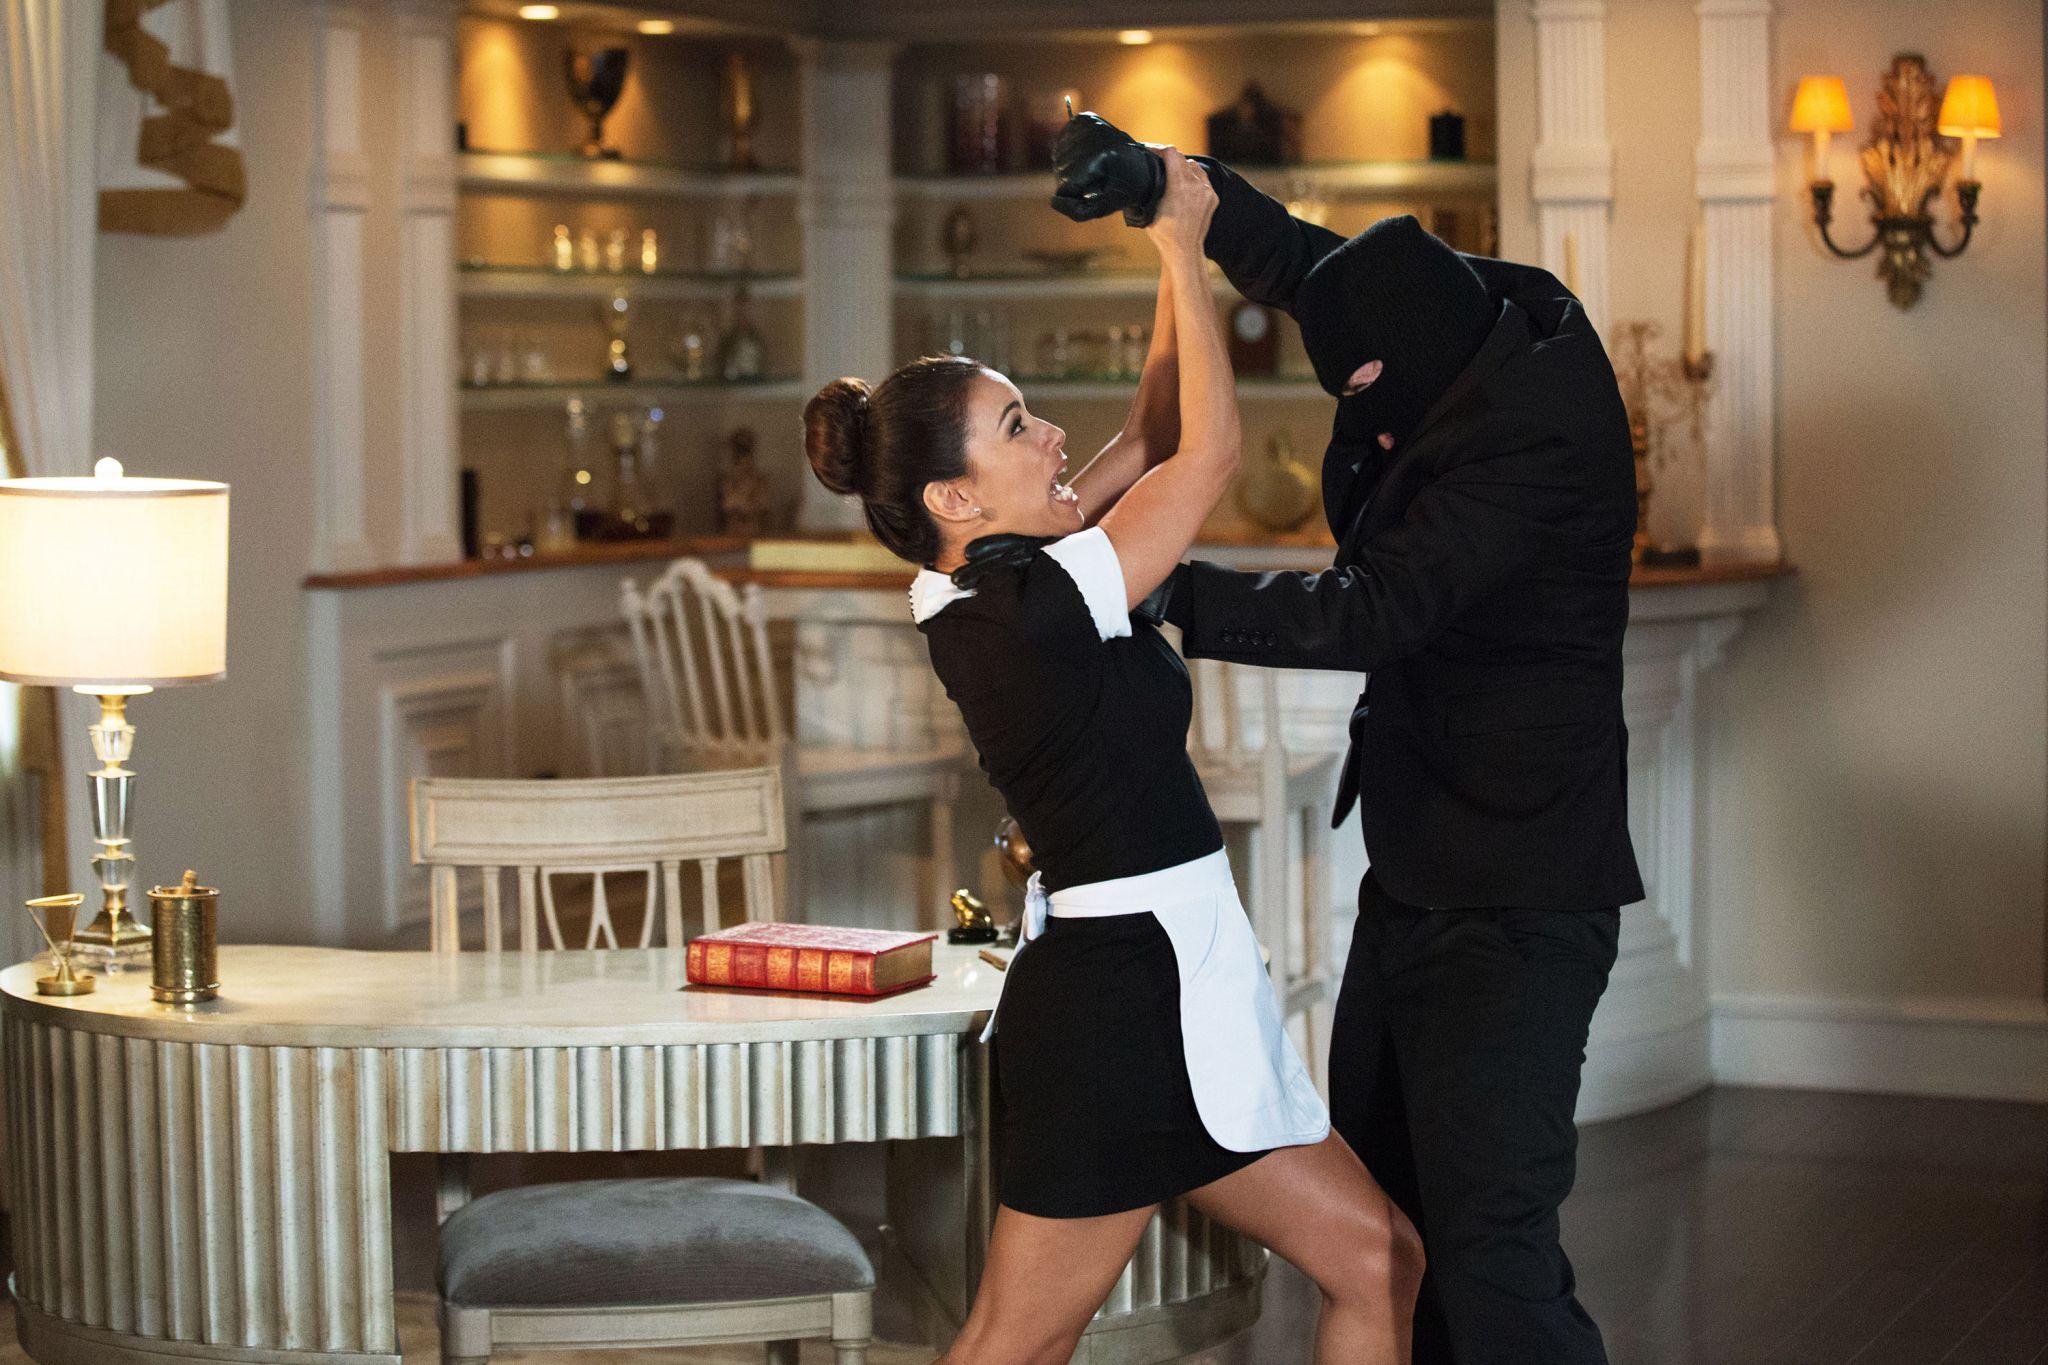 Watch Eva Longoria Get Jabbed Stabbed On Maids San